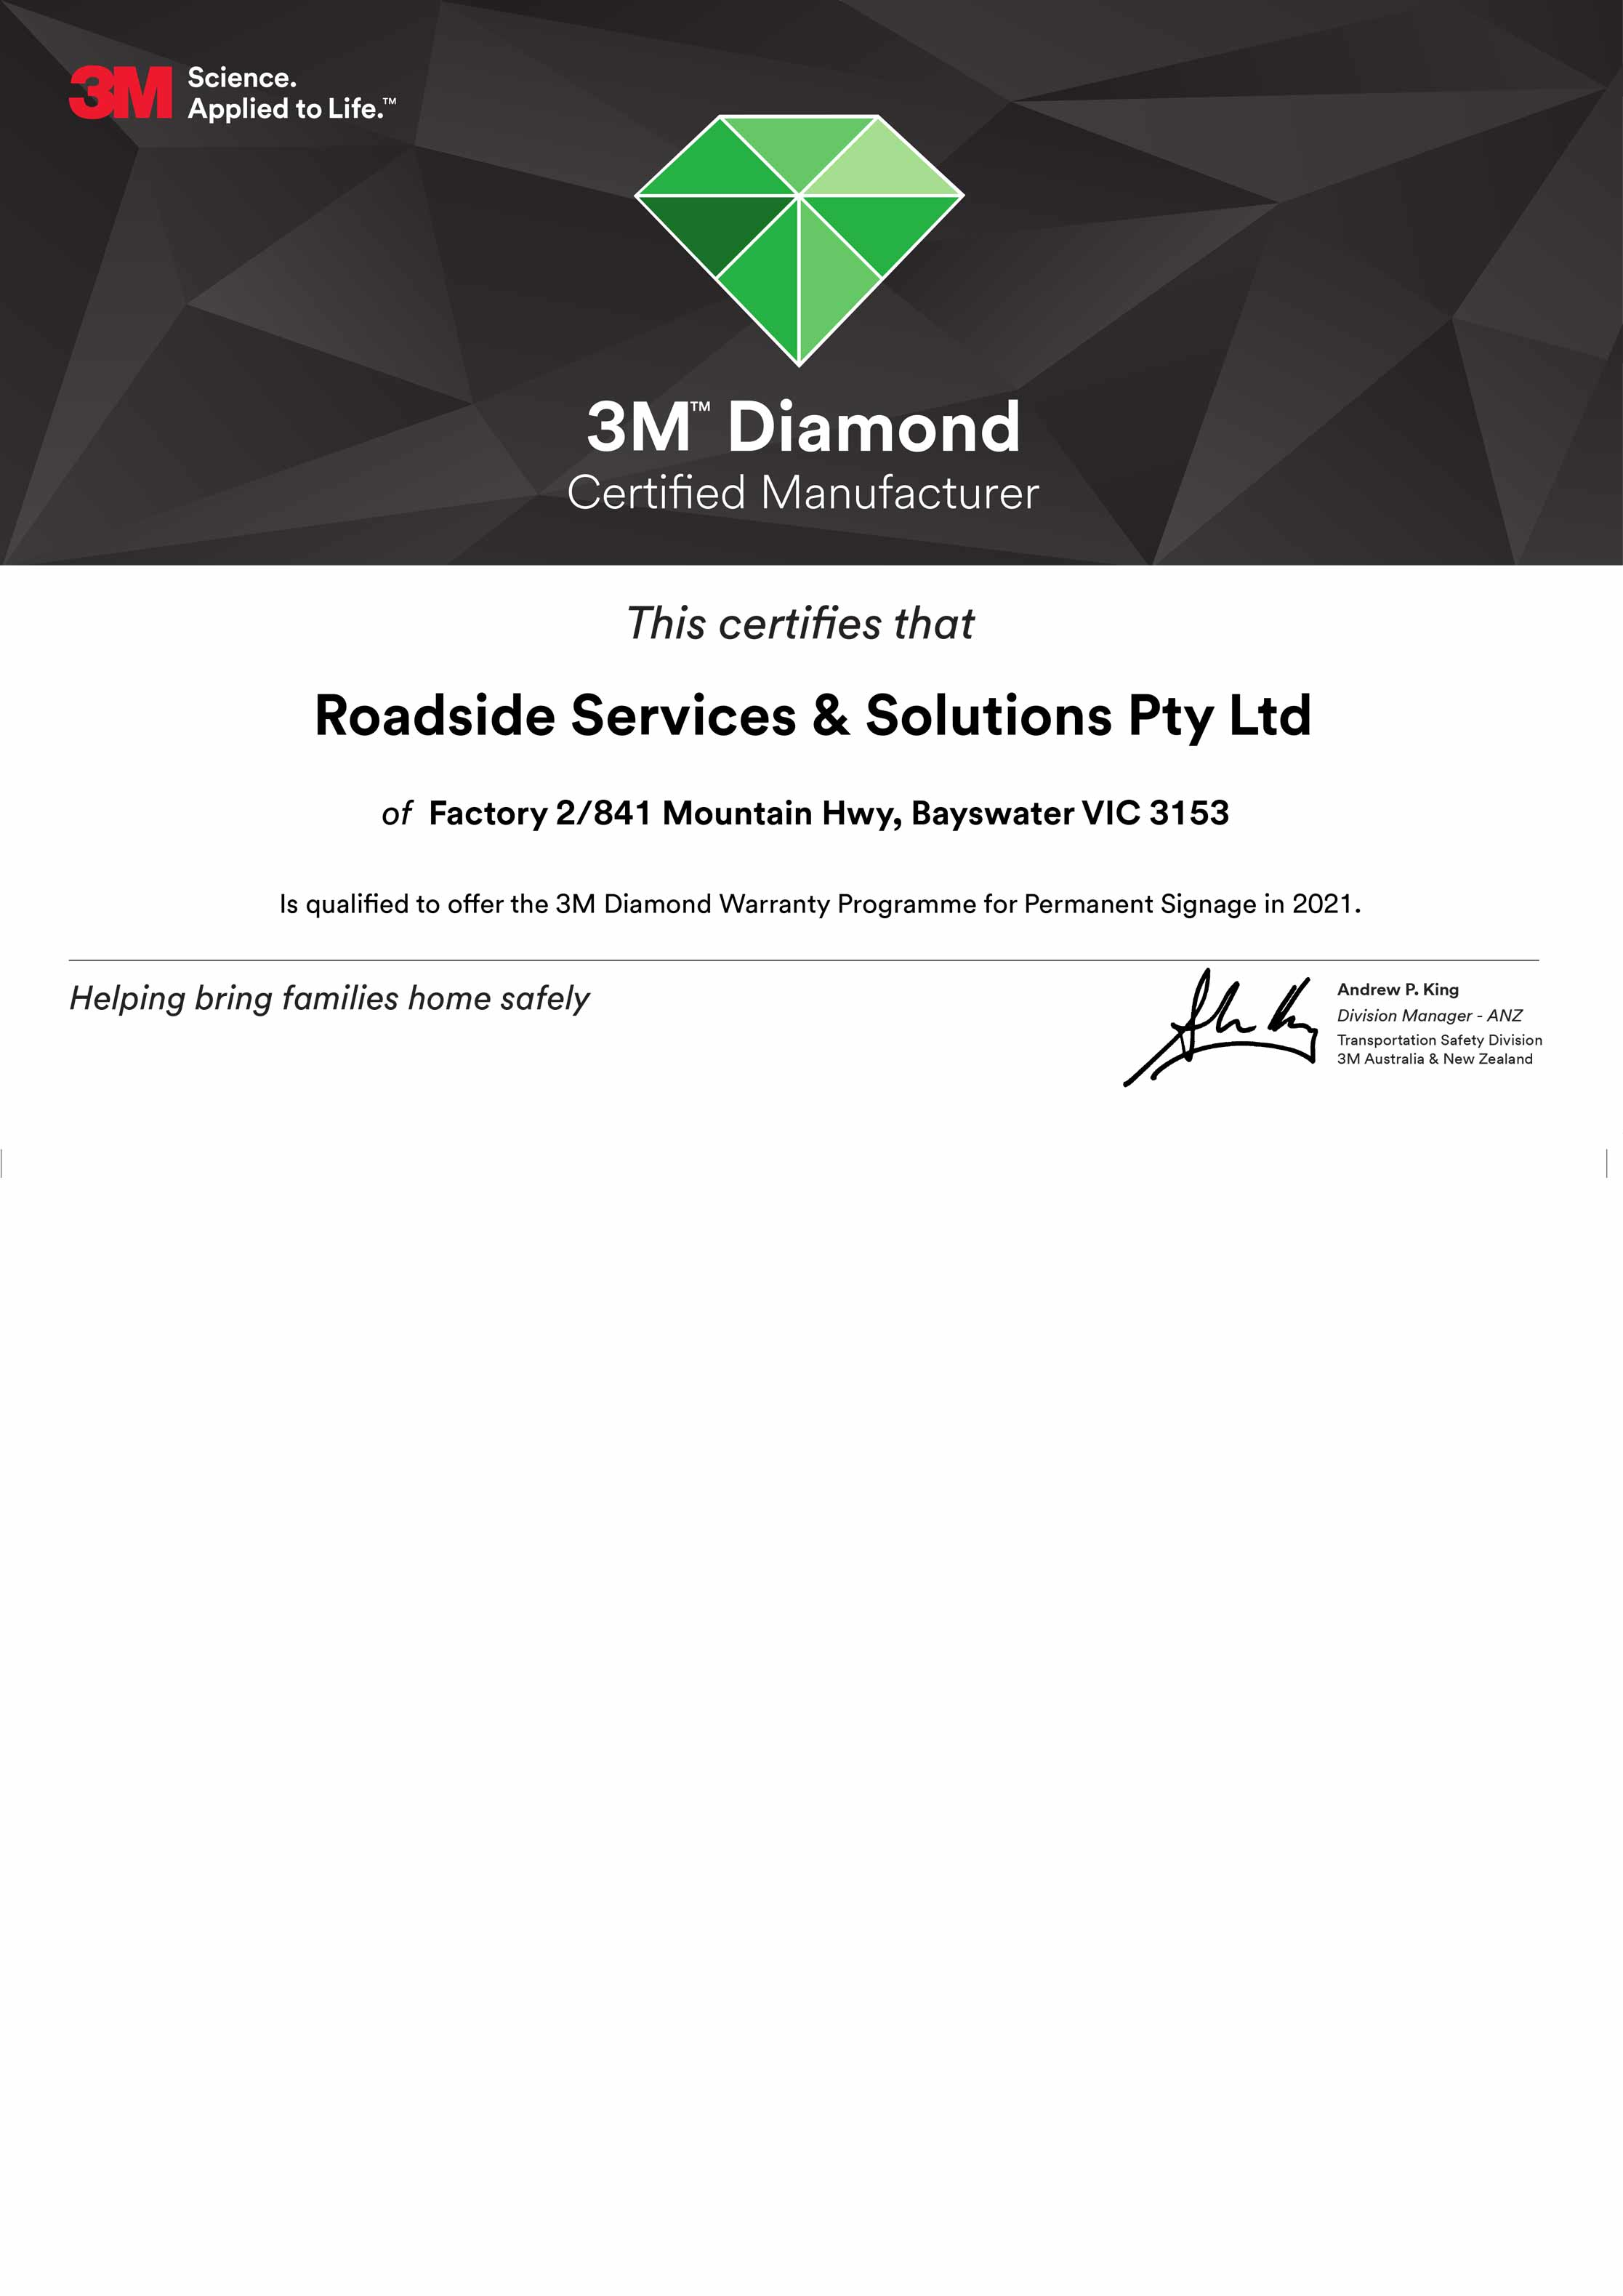 3M Diamond Certified Manufacturer Certificate